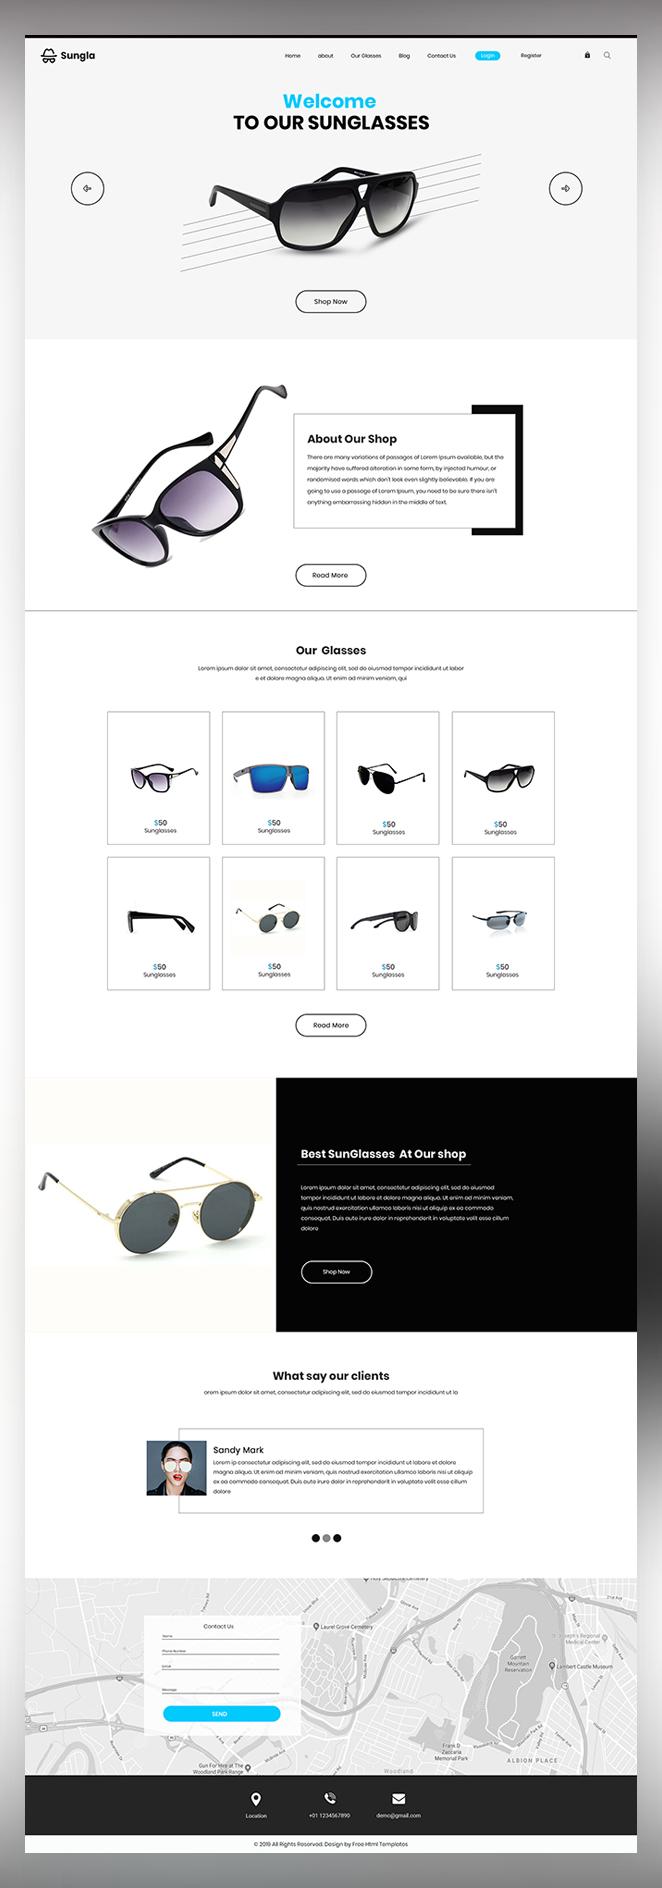 sungla glasses shop psd template